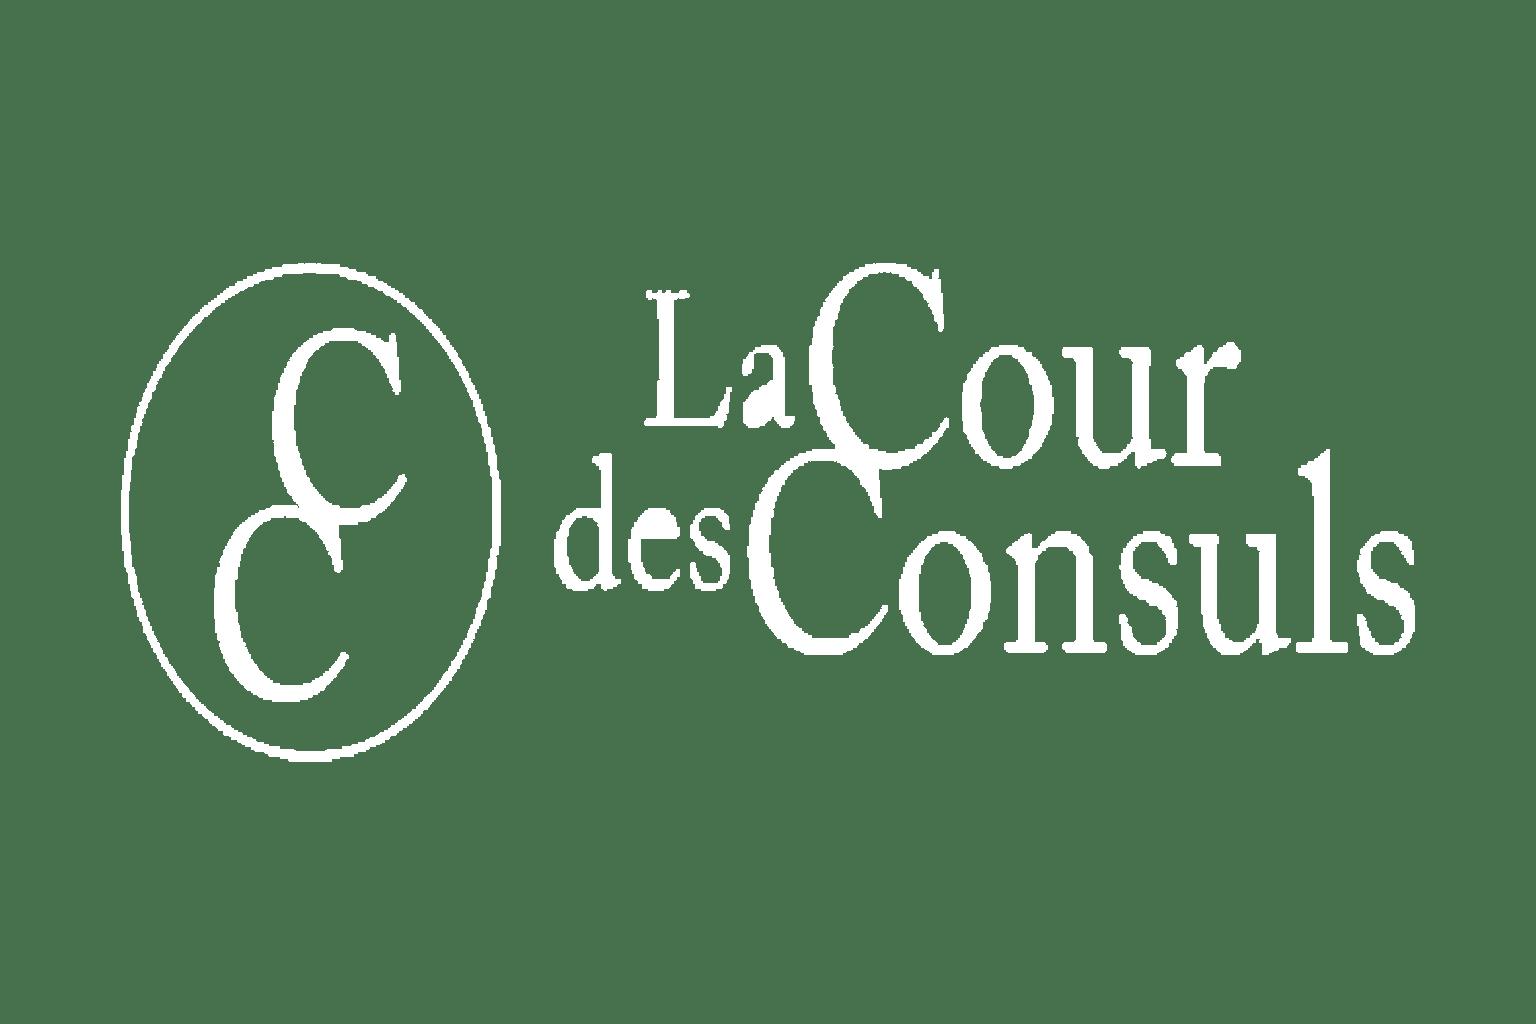 COUR DES CONSULS